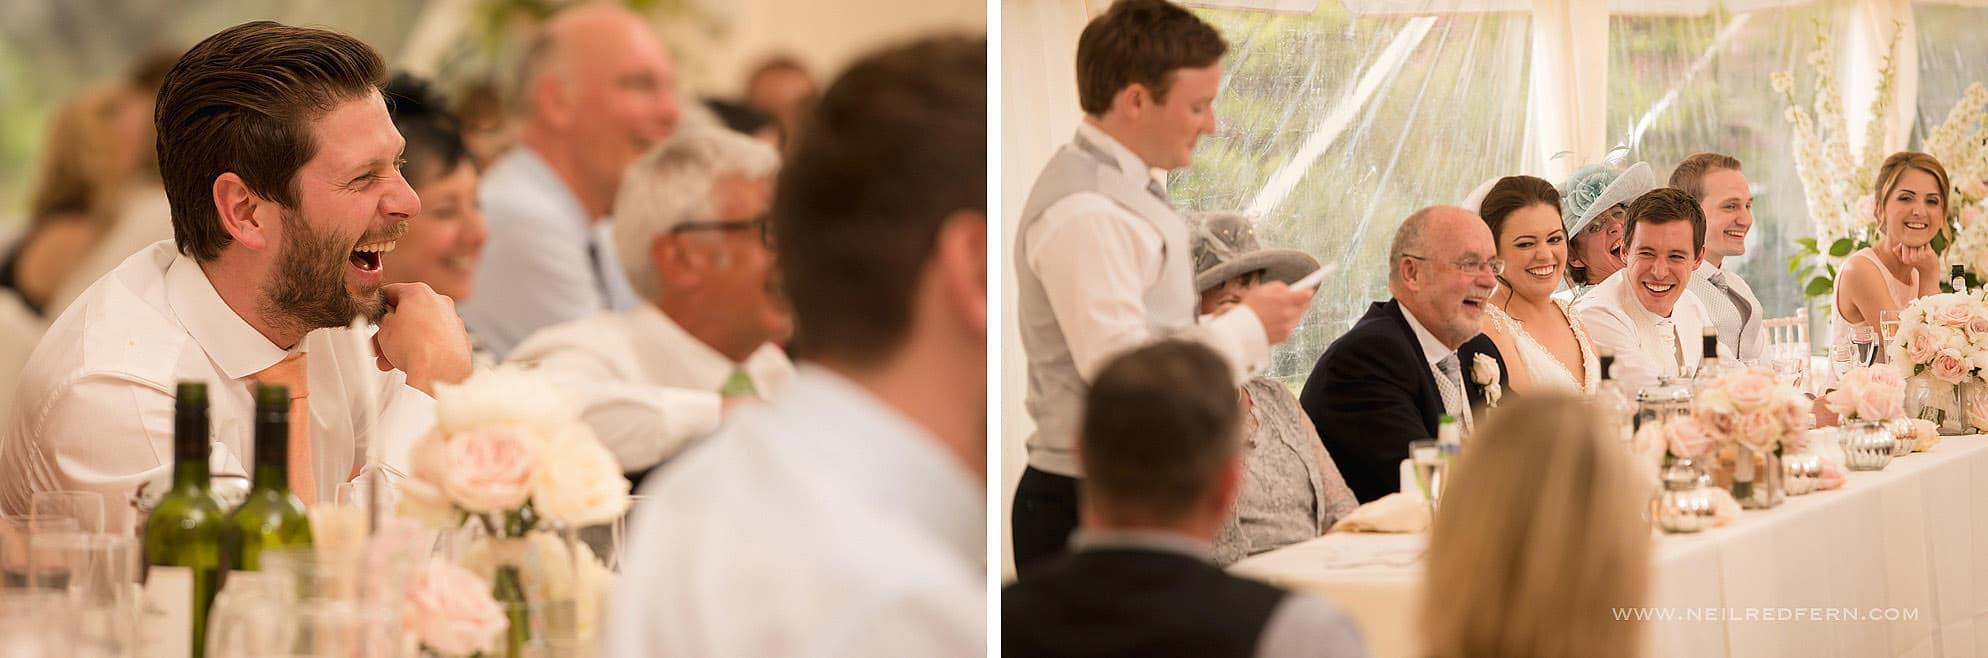 Cragwood Hotel wedding photographs 14